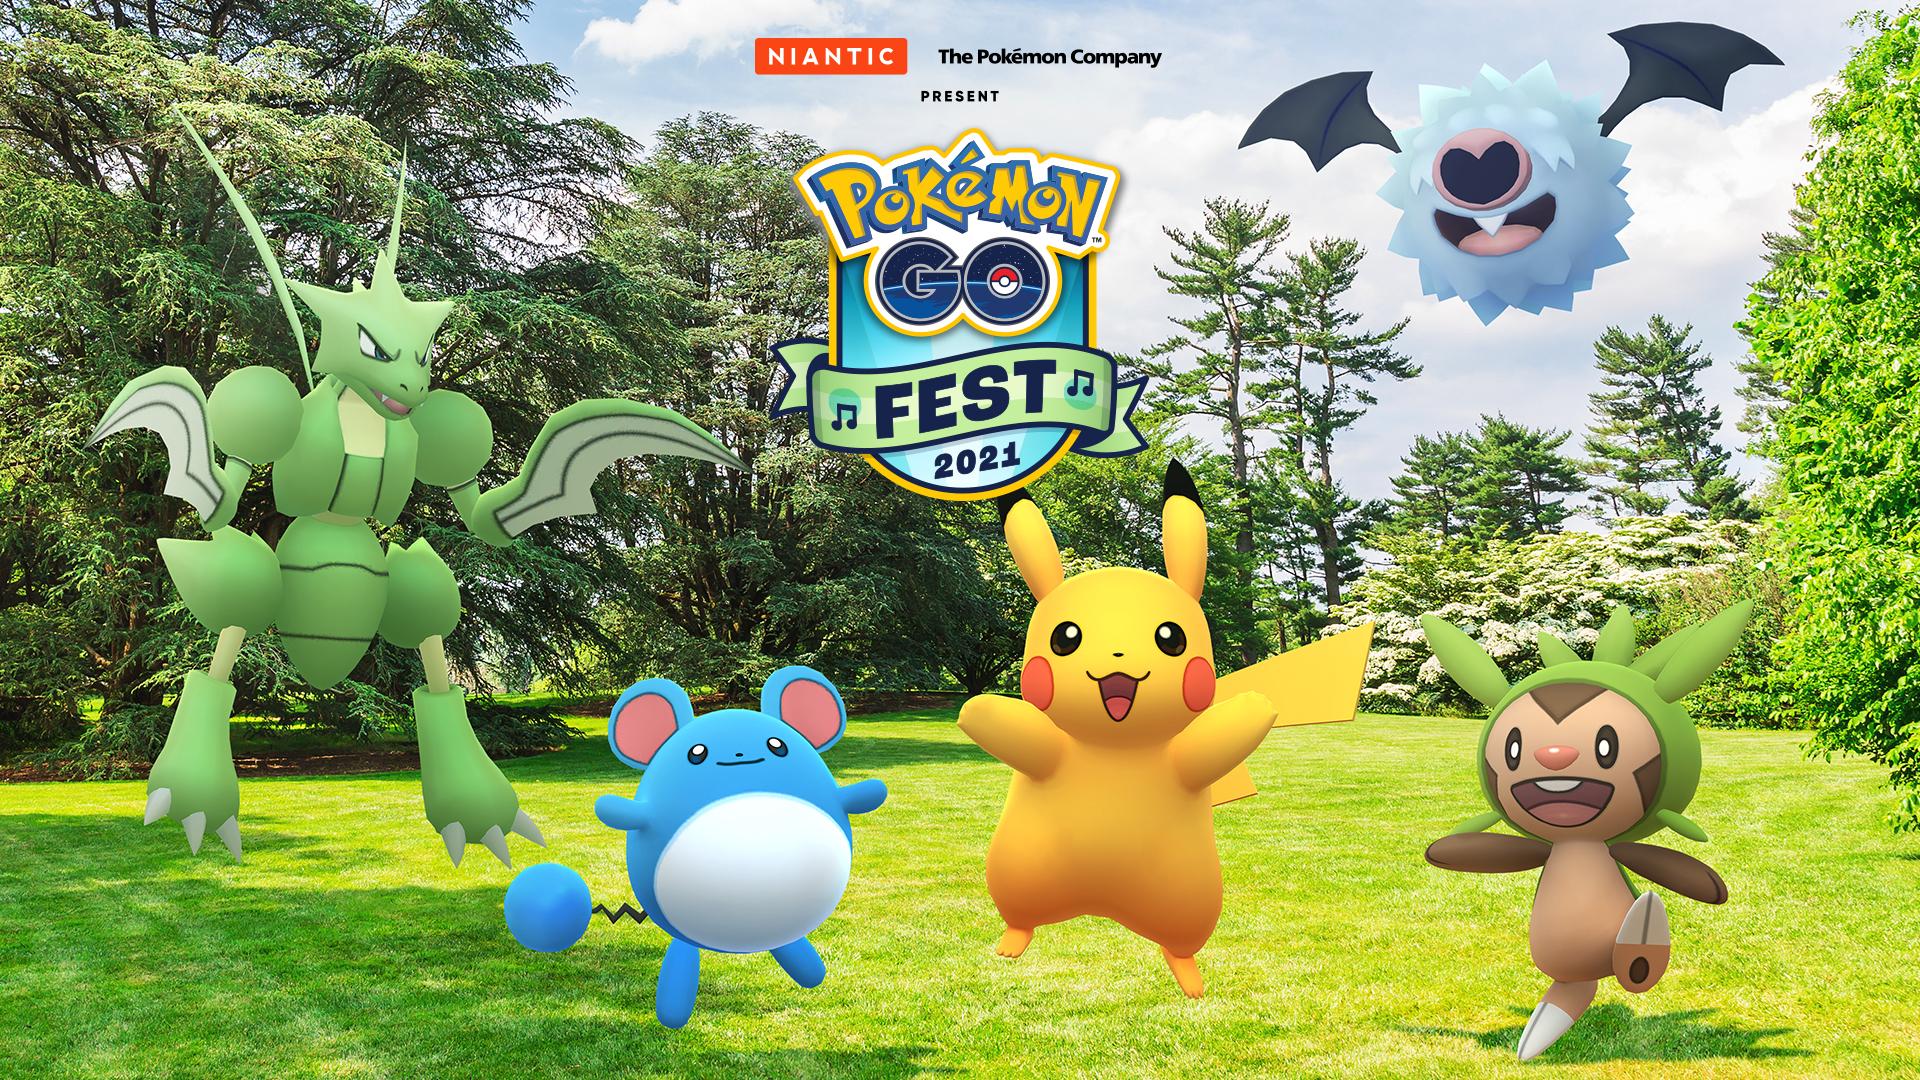 「Pokémon GO Fest 2021」が7月に開催決定!